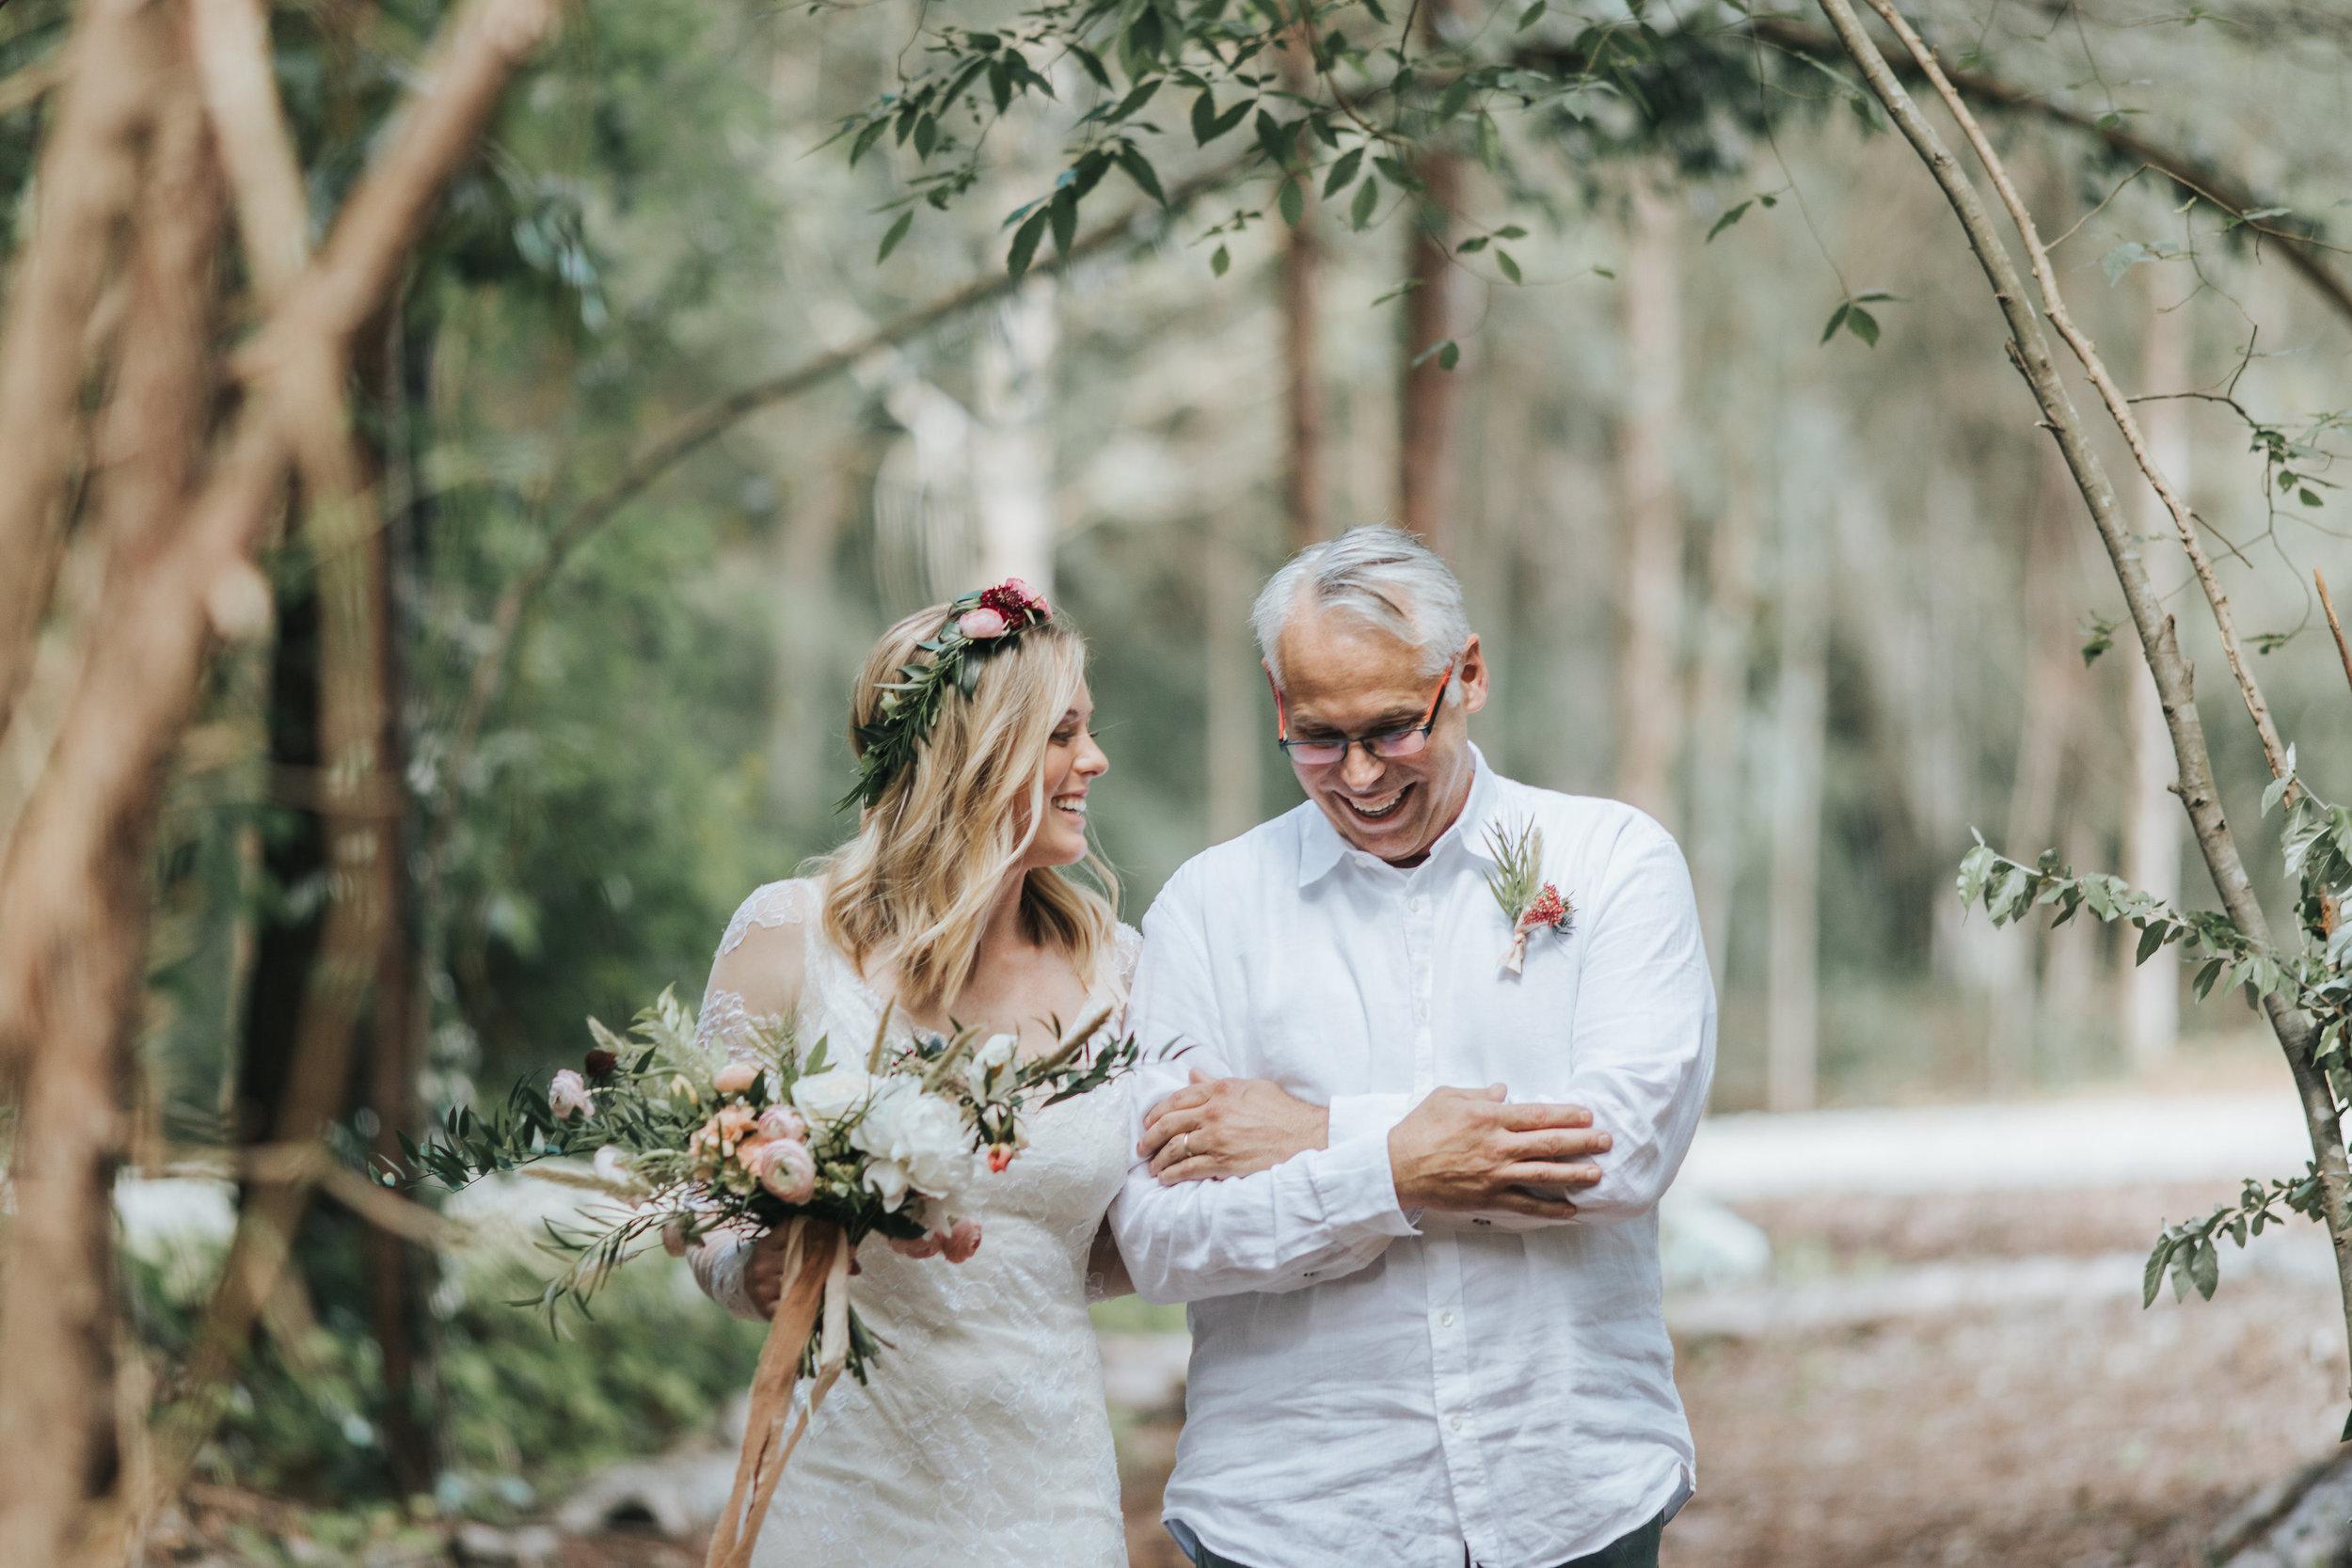 SethandKate_Wedding_MSP_HighRes(521of1195).jpg